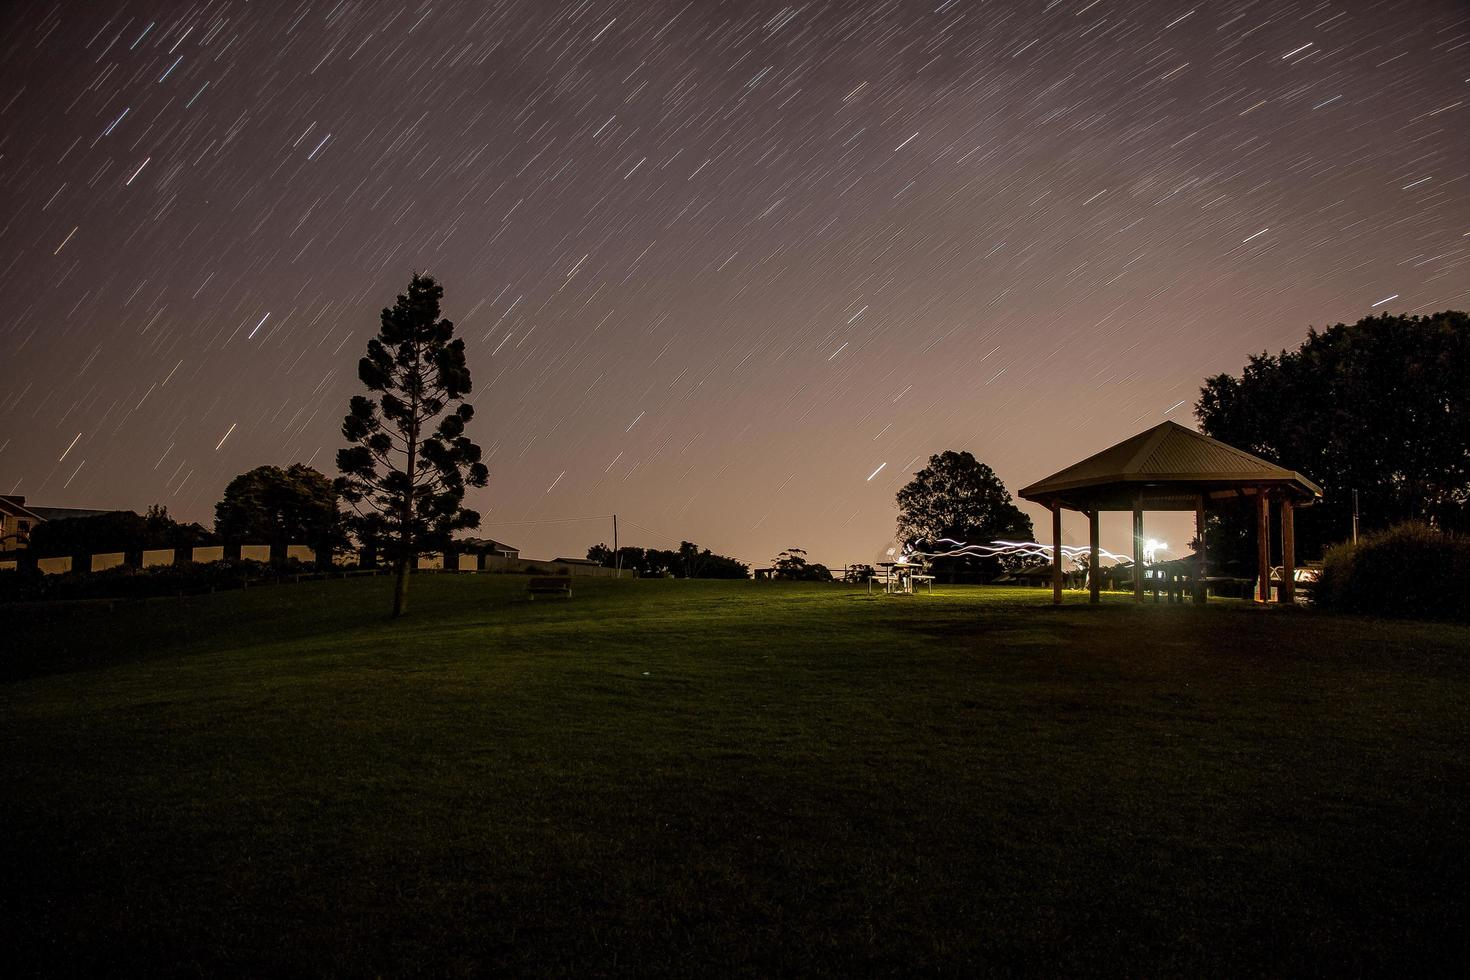 Brown gazebo under starry night  photo